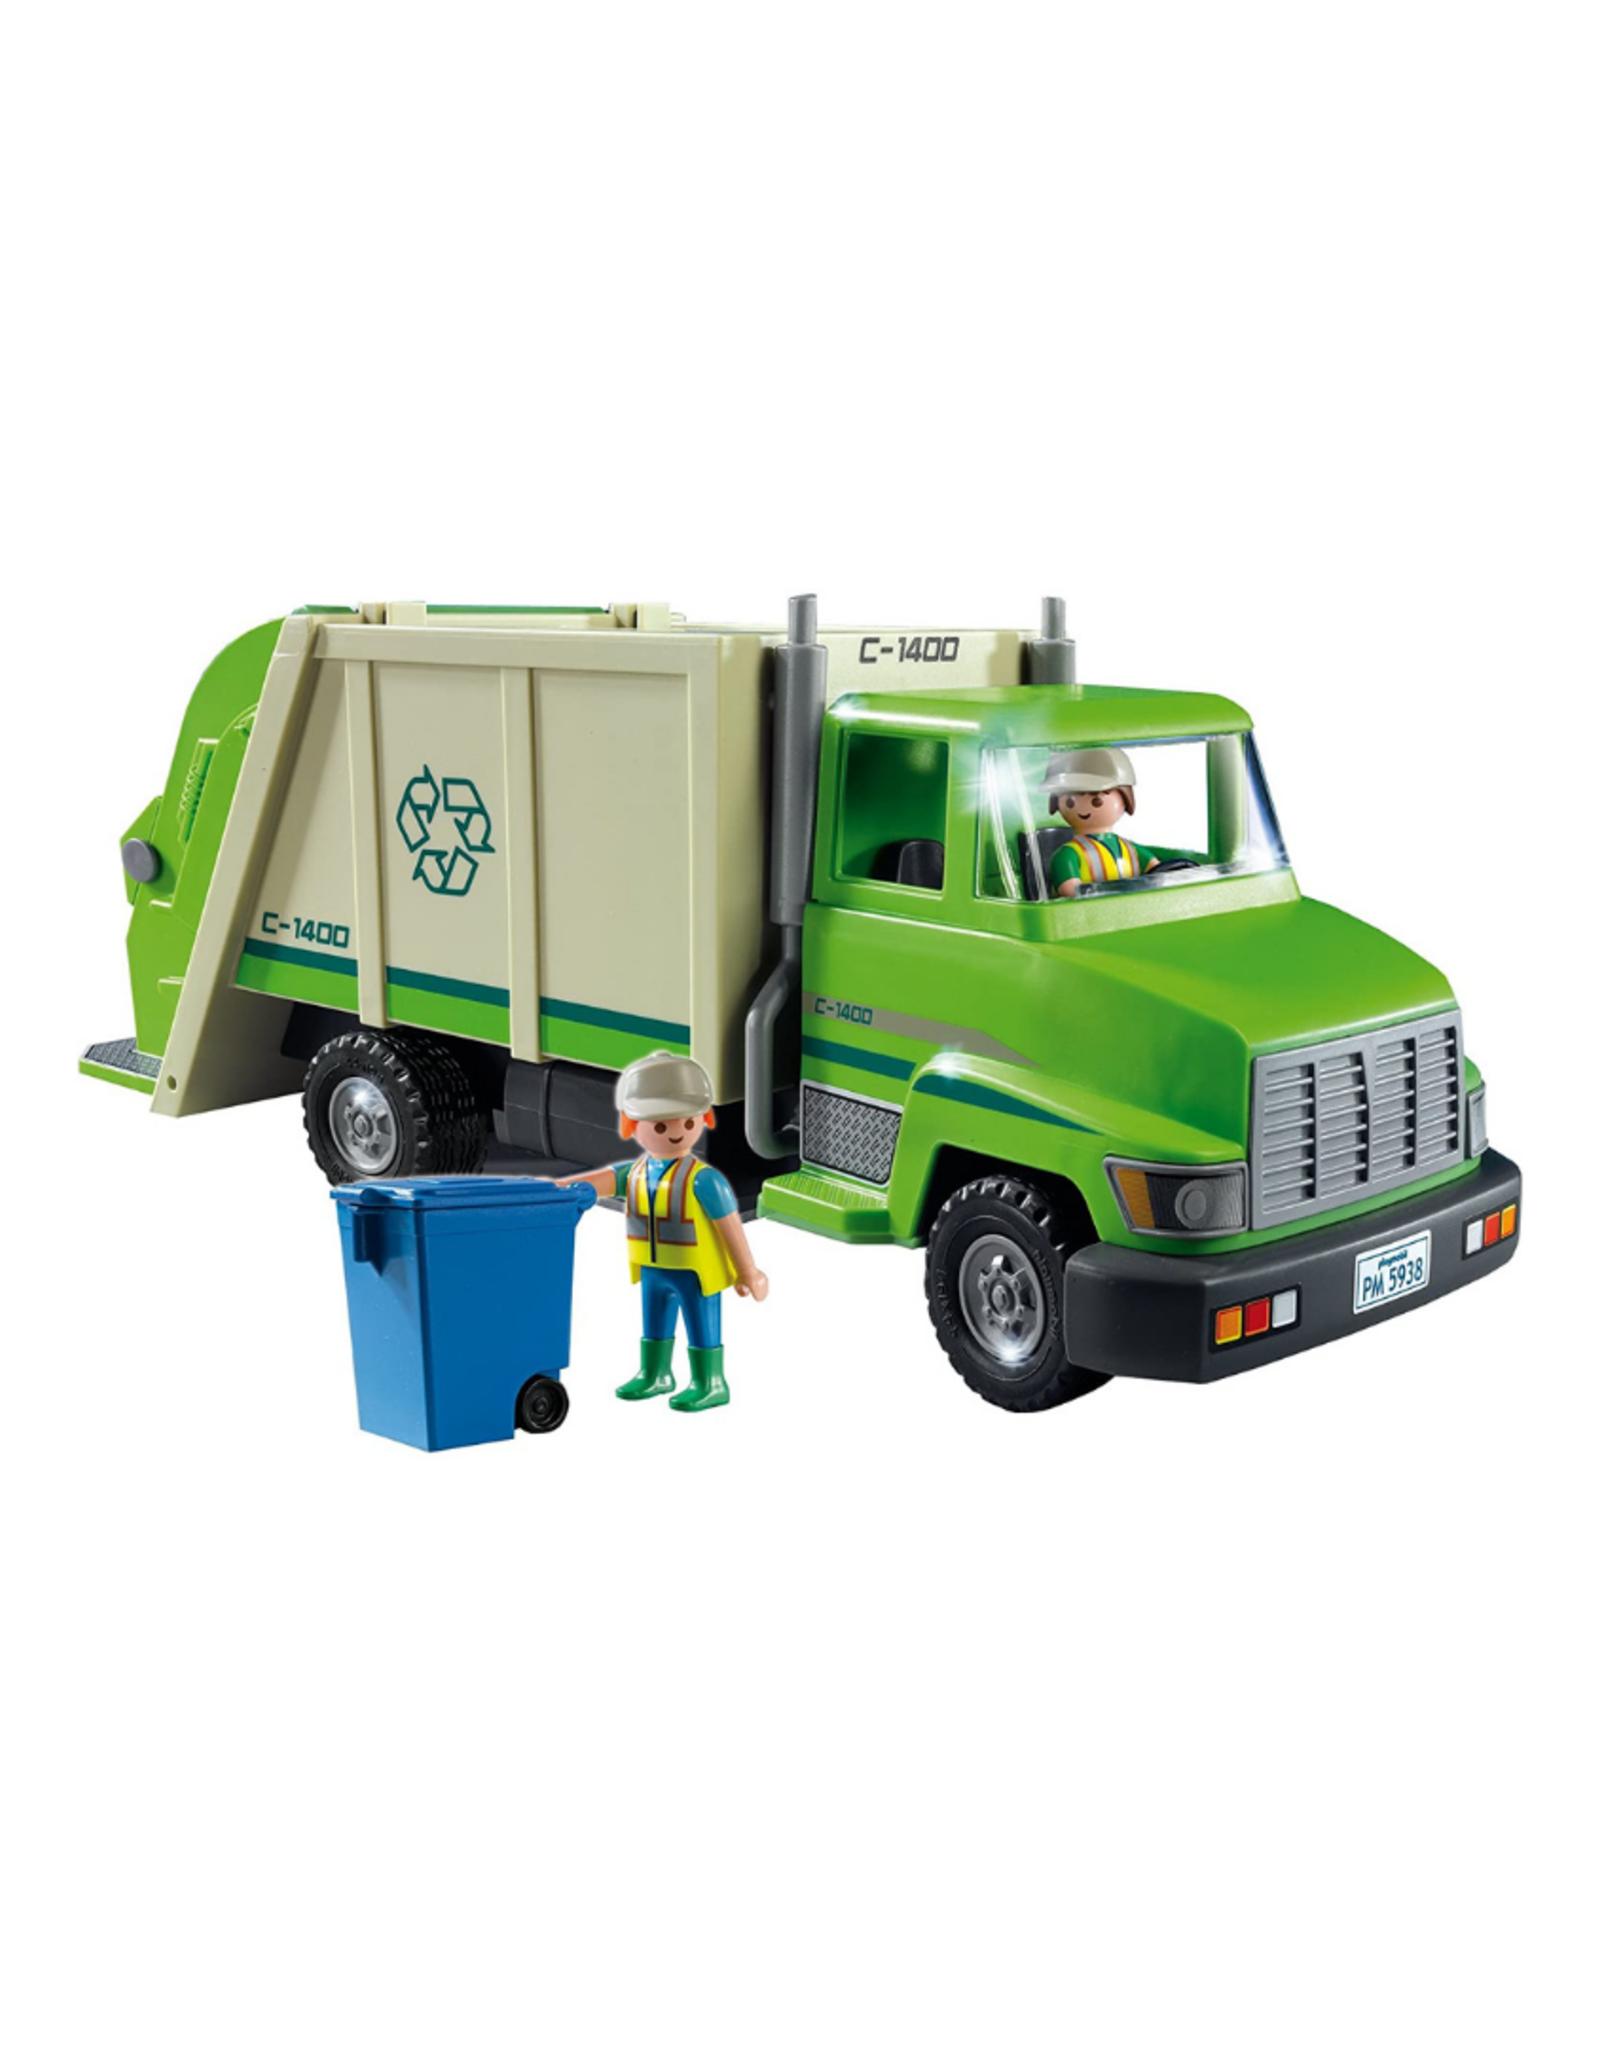 Playmobil PM - Green Recycling Truck